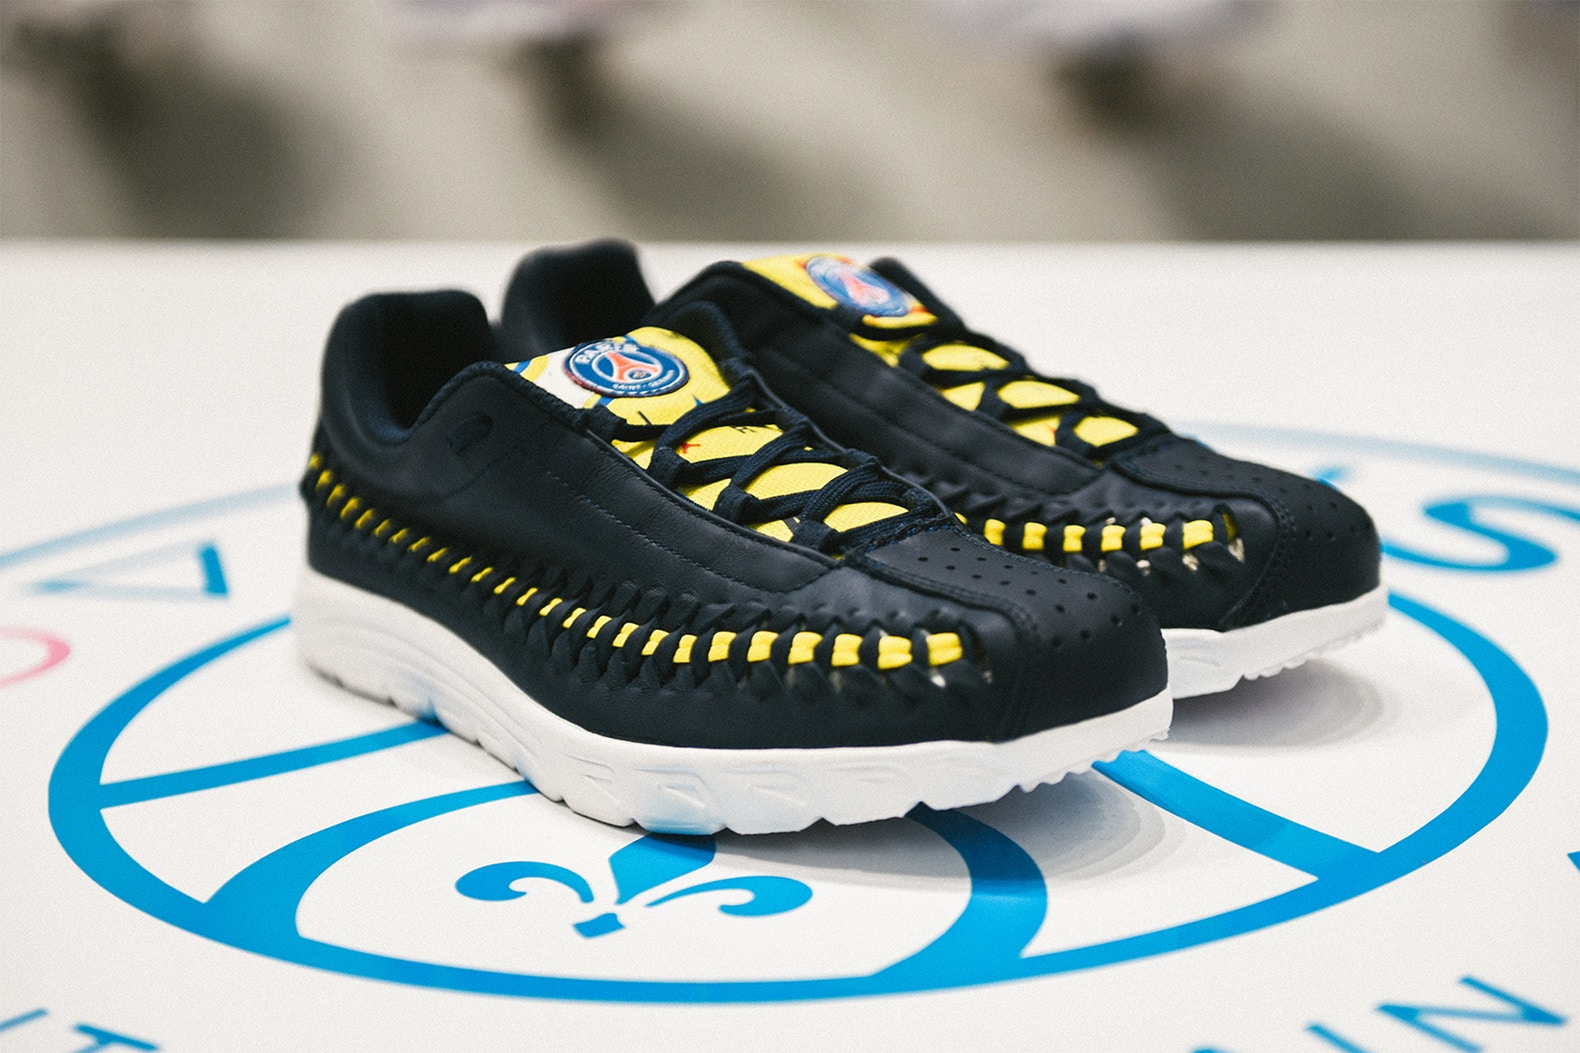 shoe-gallery-paris-saint-germain-nike-mayfly-woven-2